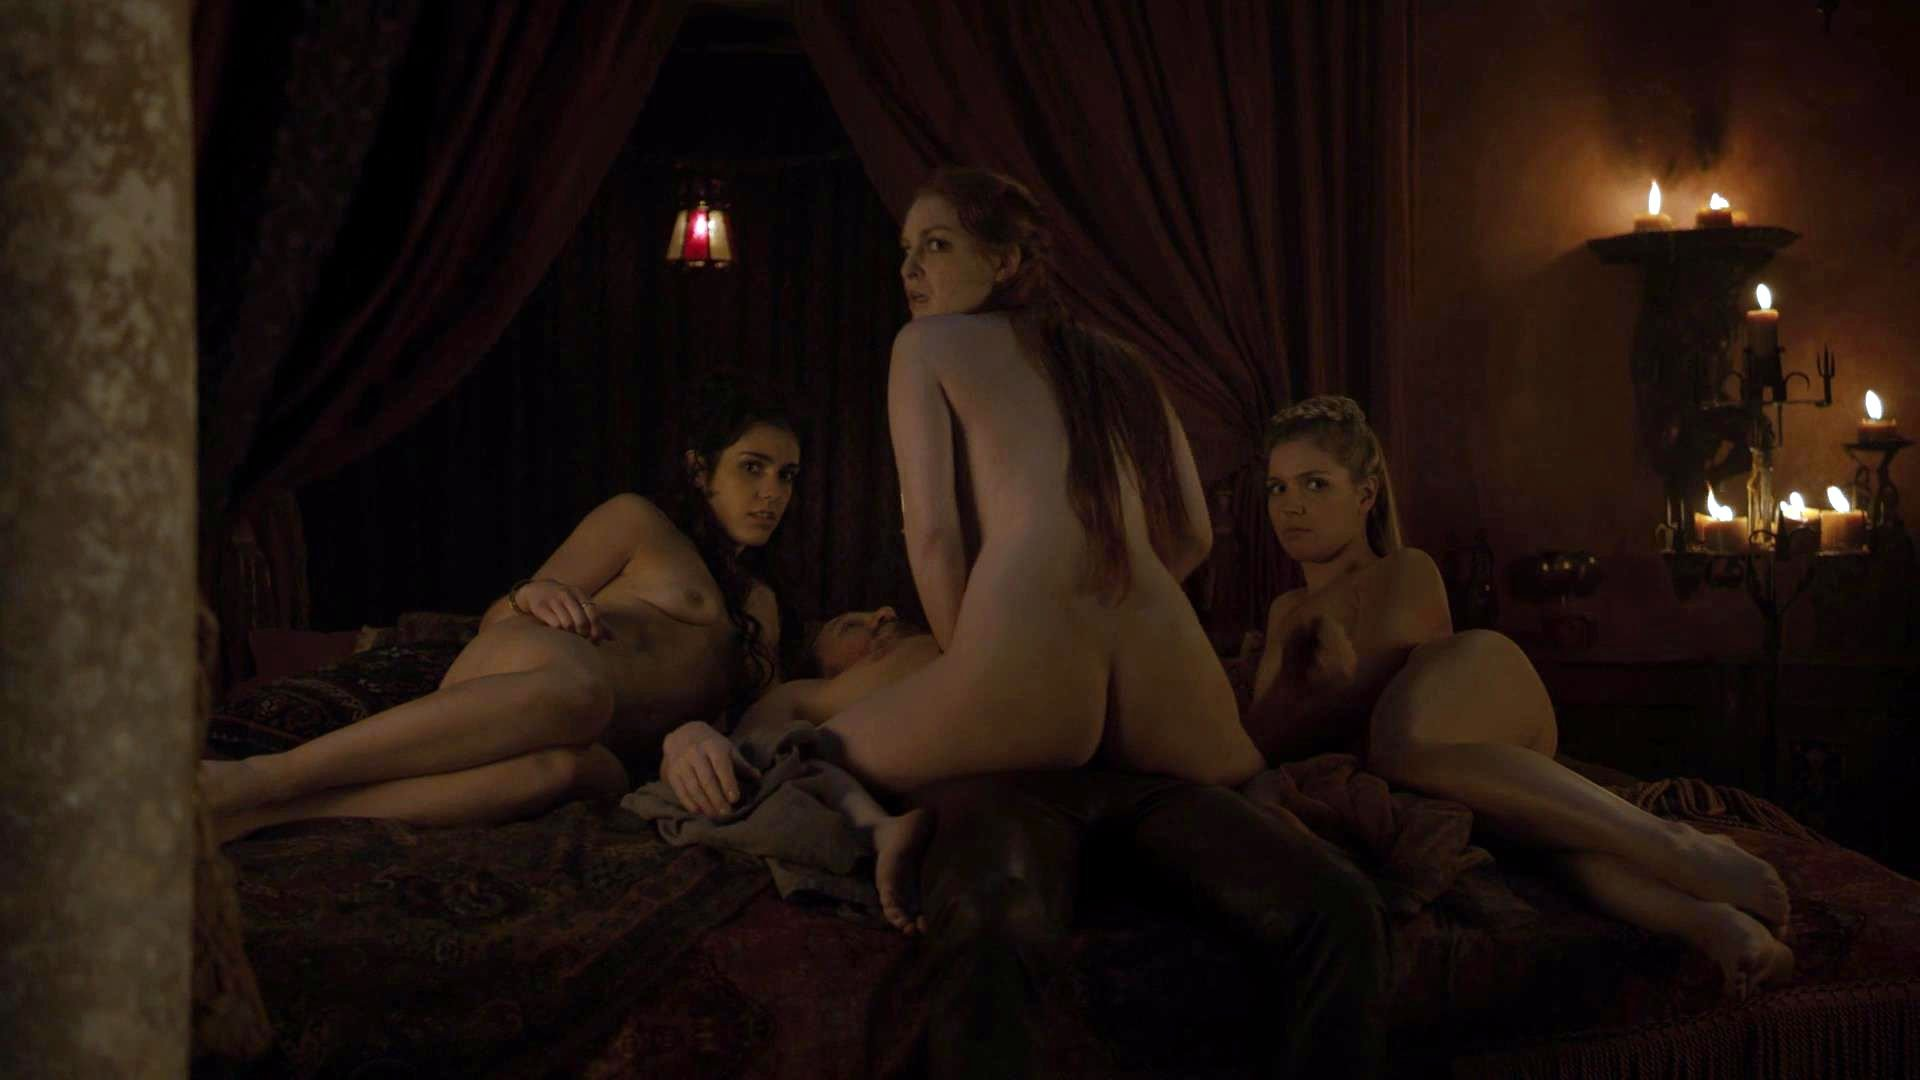 Nude theon greyjoy 'Game of